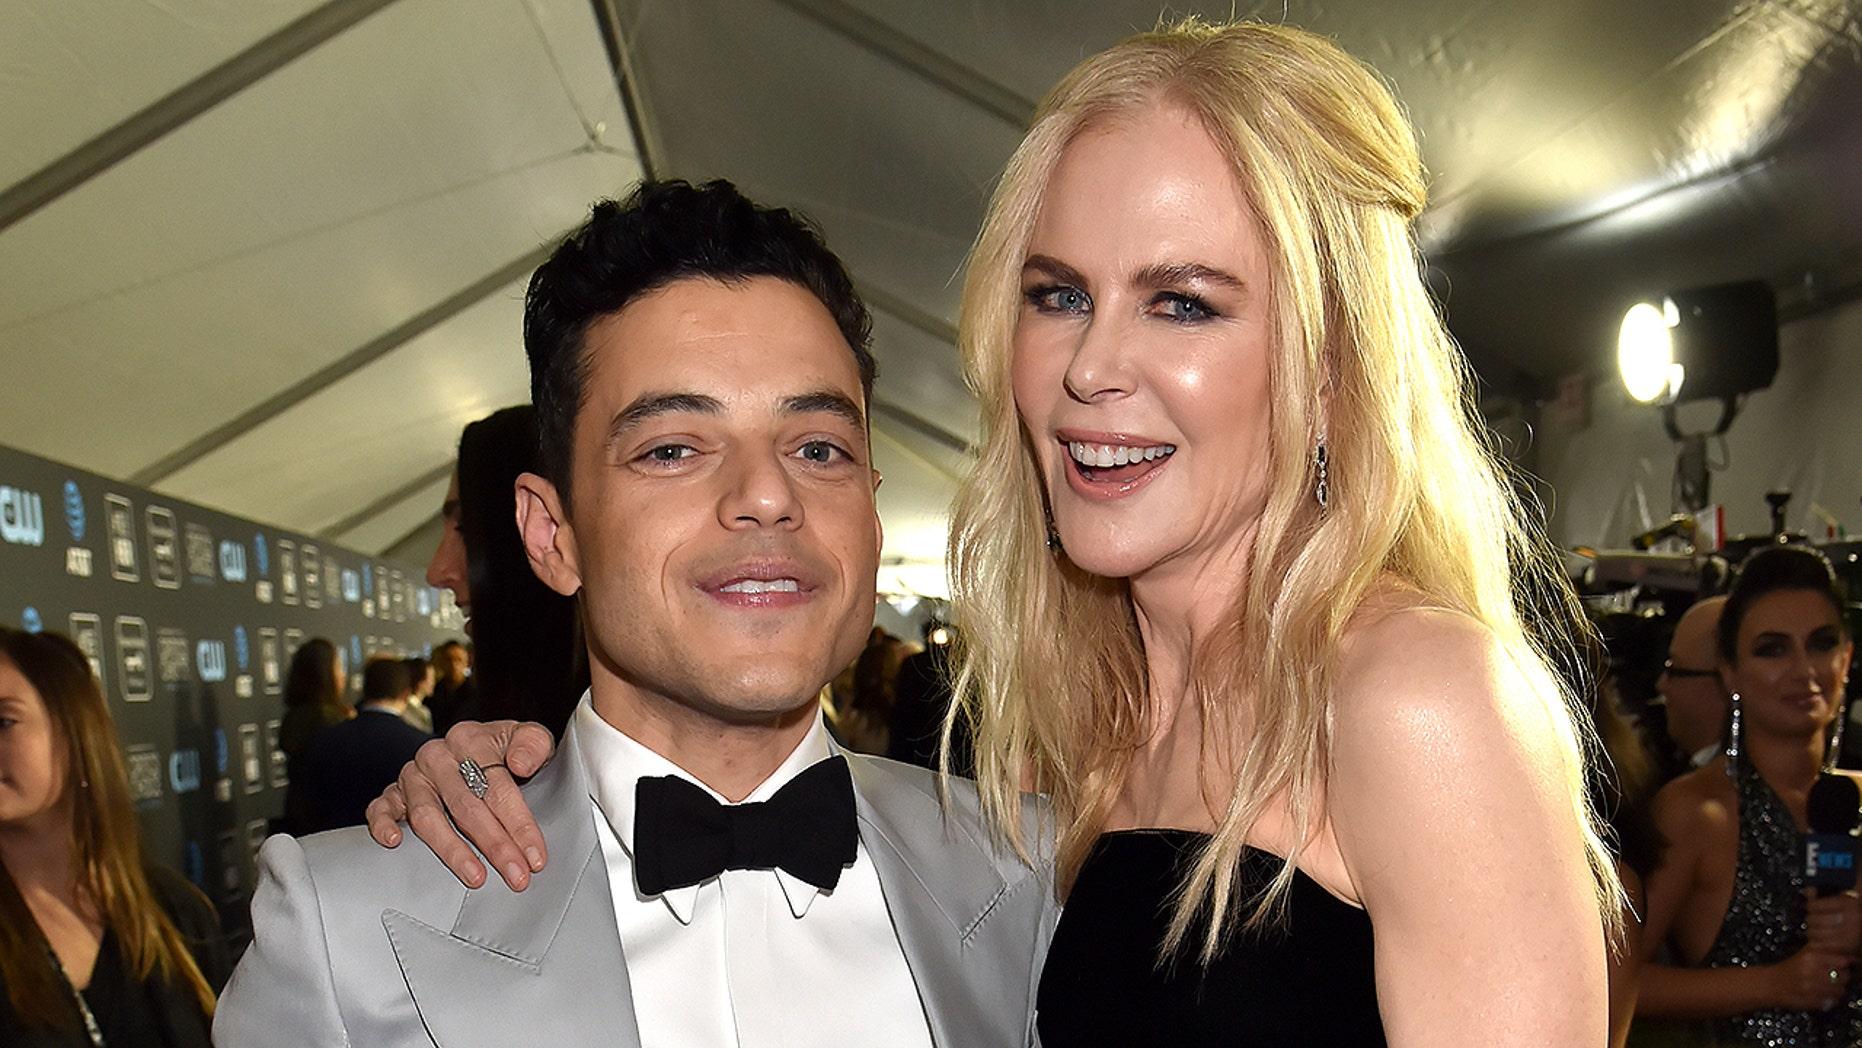 Nicole Kidman explains why she snubbed Rumi Malek at the Golden Globes